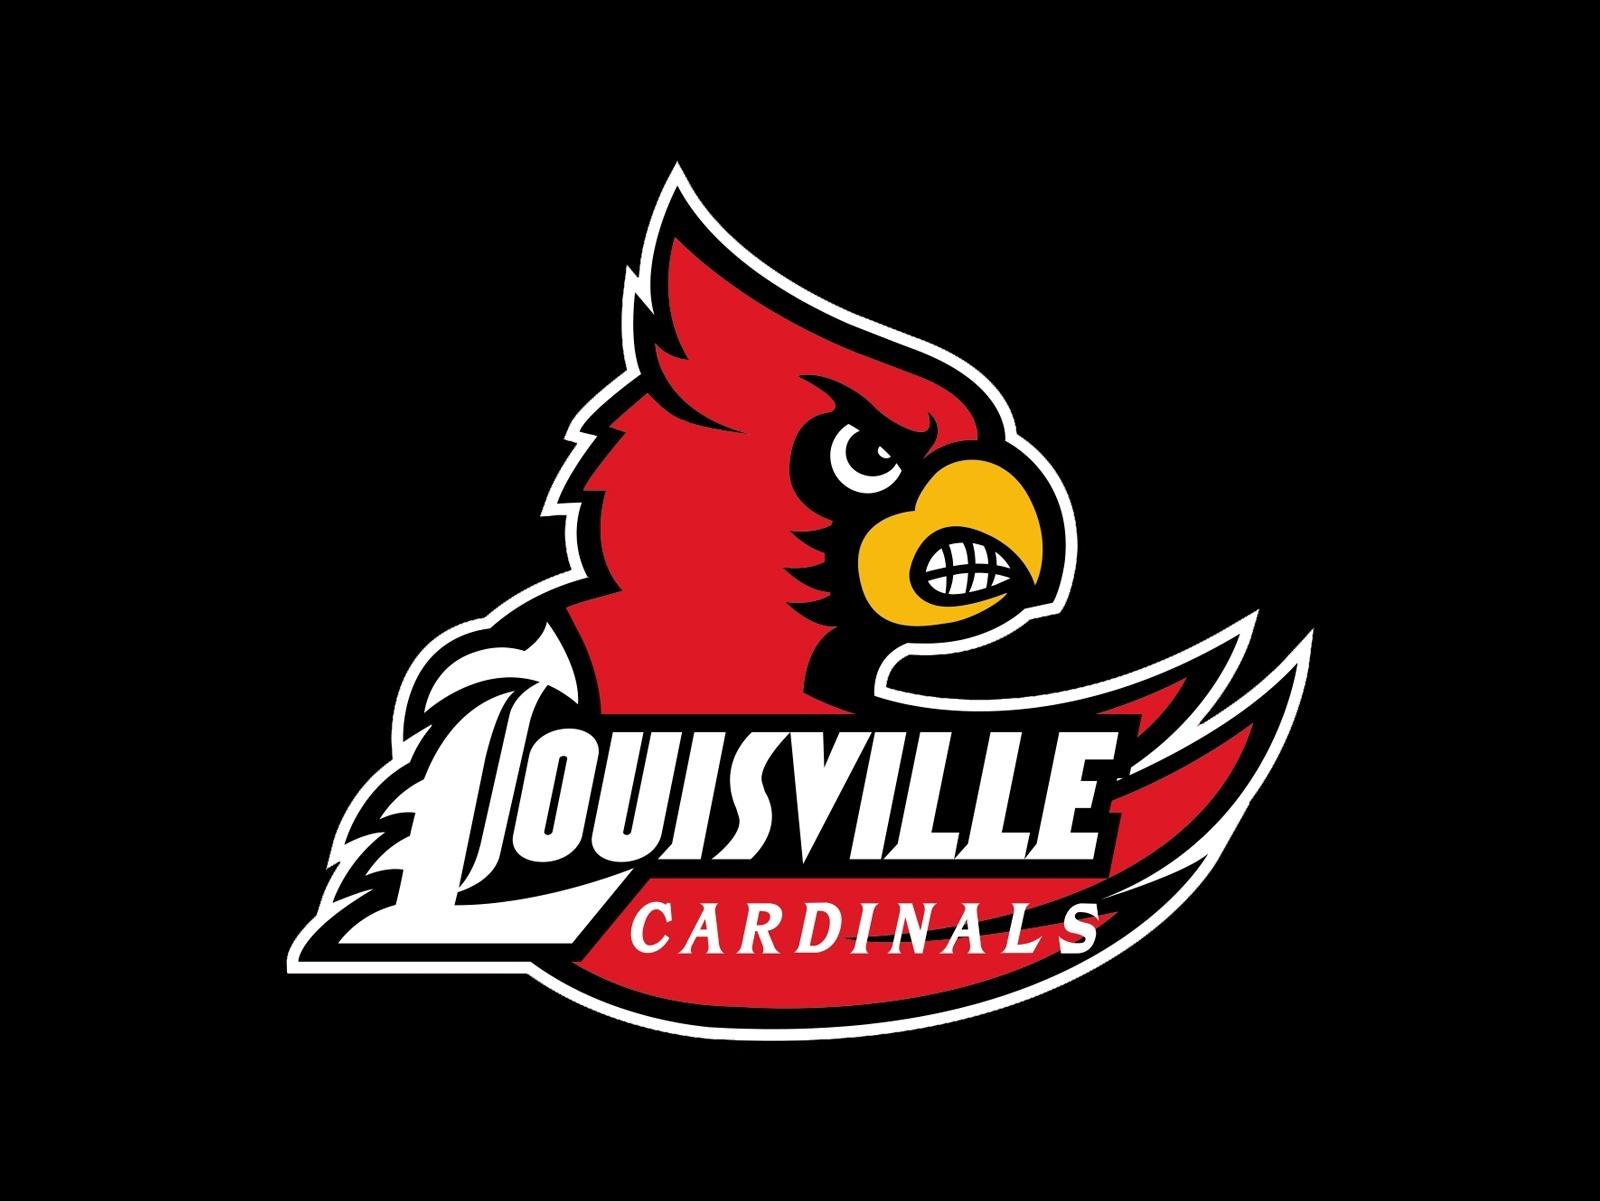 IMAGE(https://cdn.swimswam.com/wp-content/uploads/2013/10/Louisville-logo-black-background.jpg)